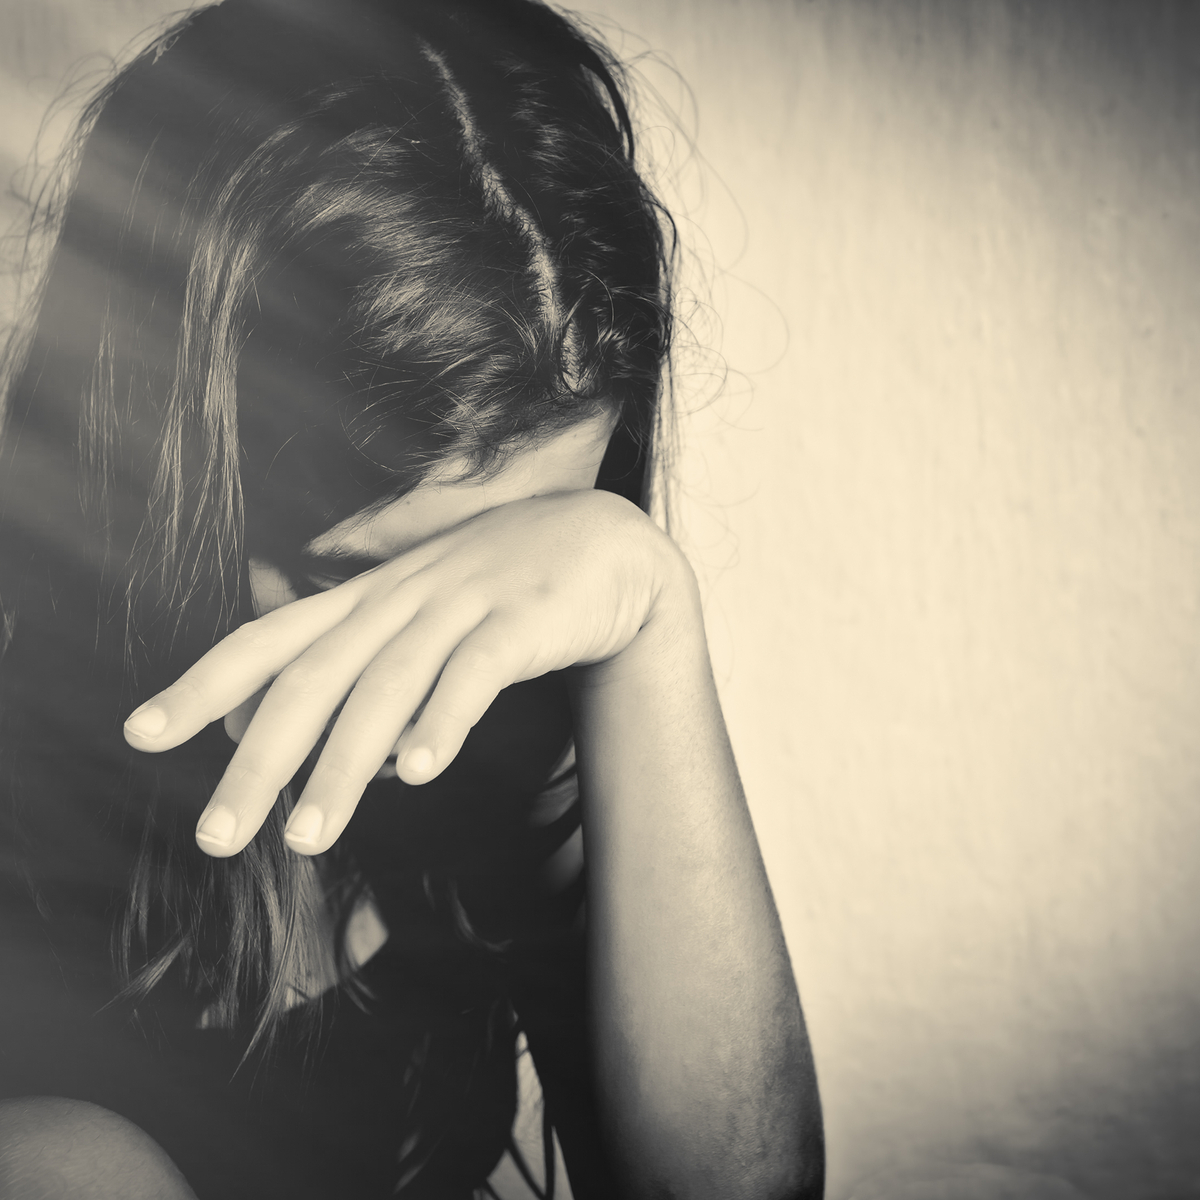 Qué implica no poder despedirse de un ser querido que fallece